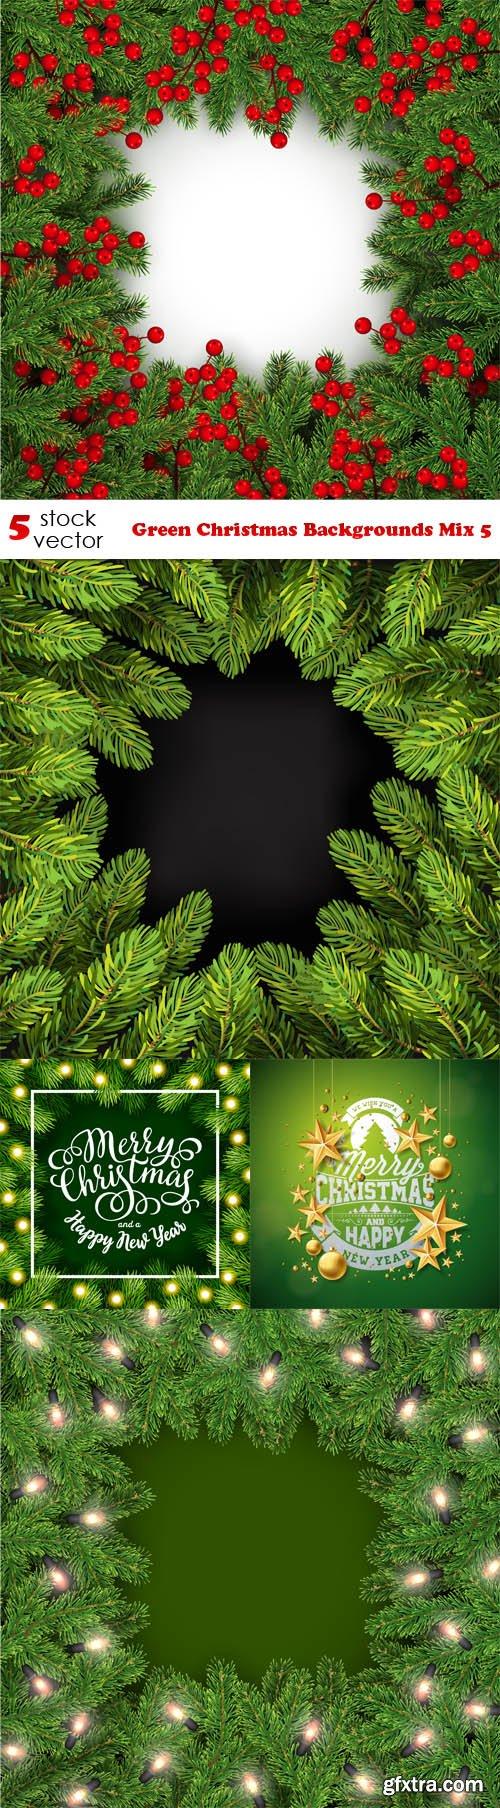 Vectors - Green Christmas Backgrounds Mix 5